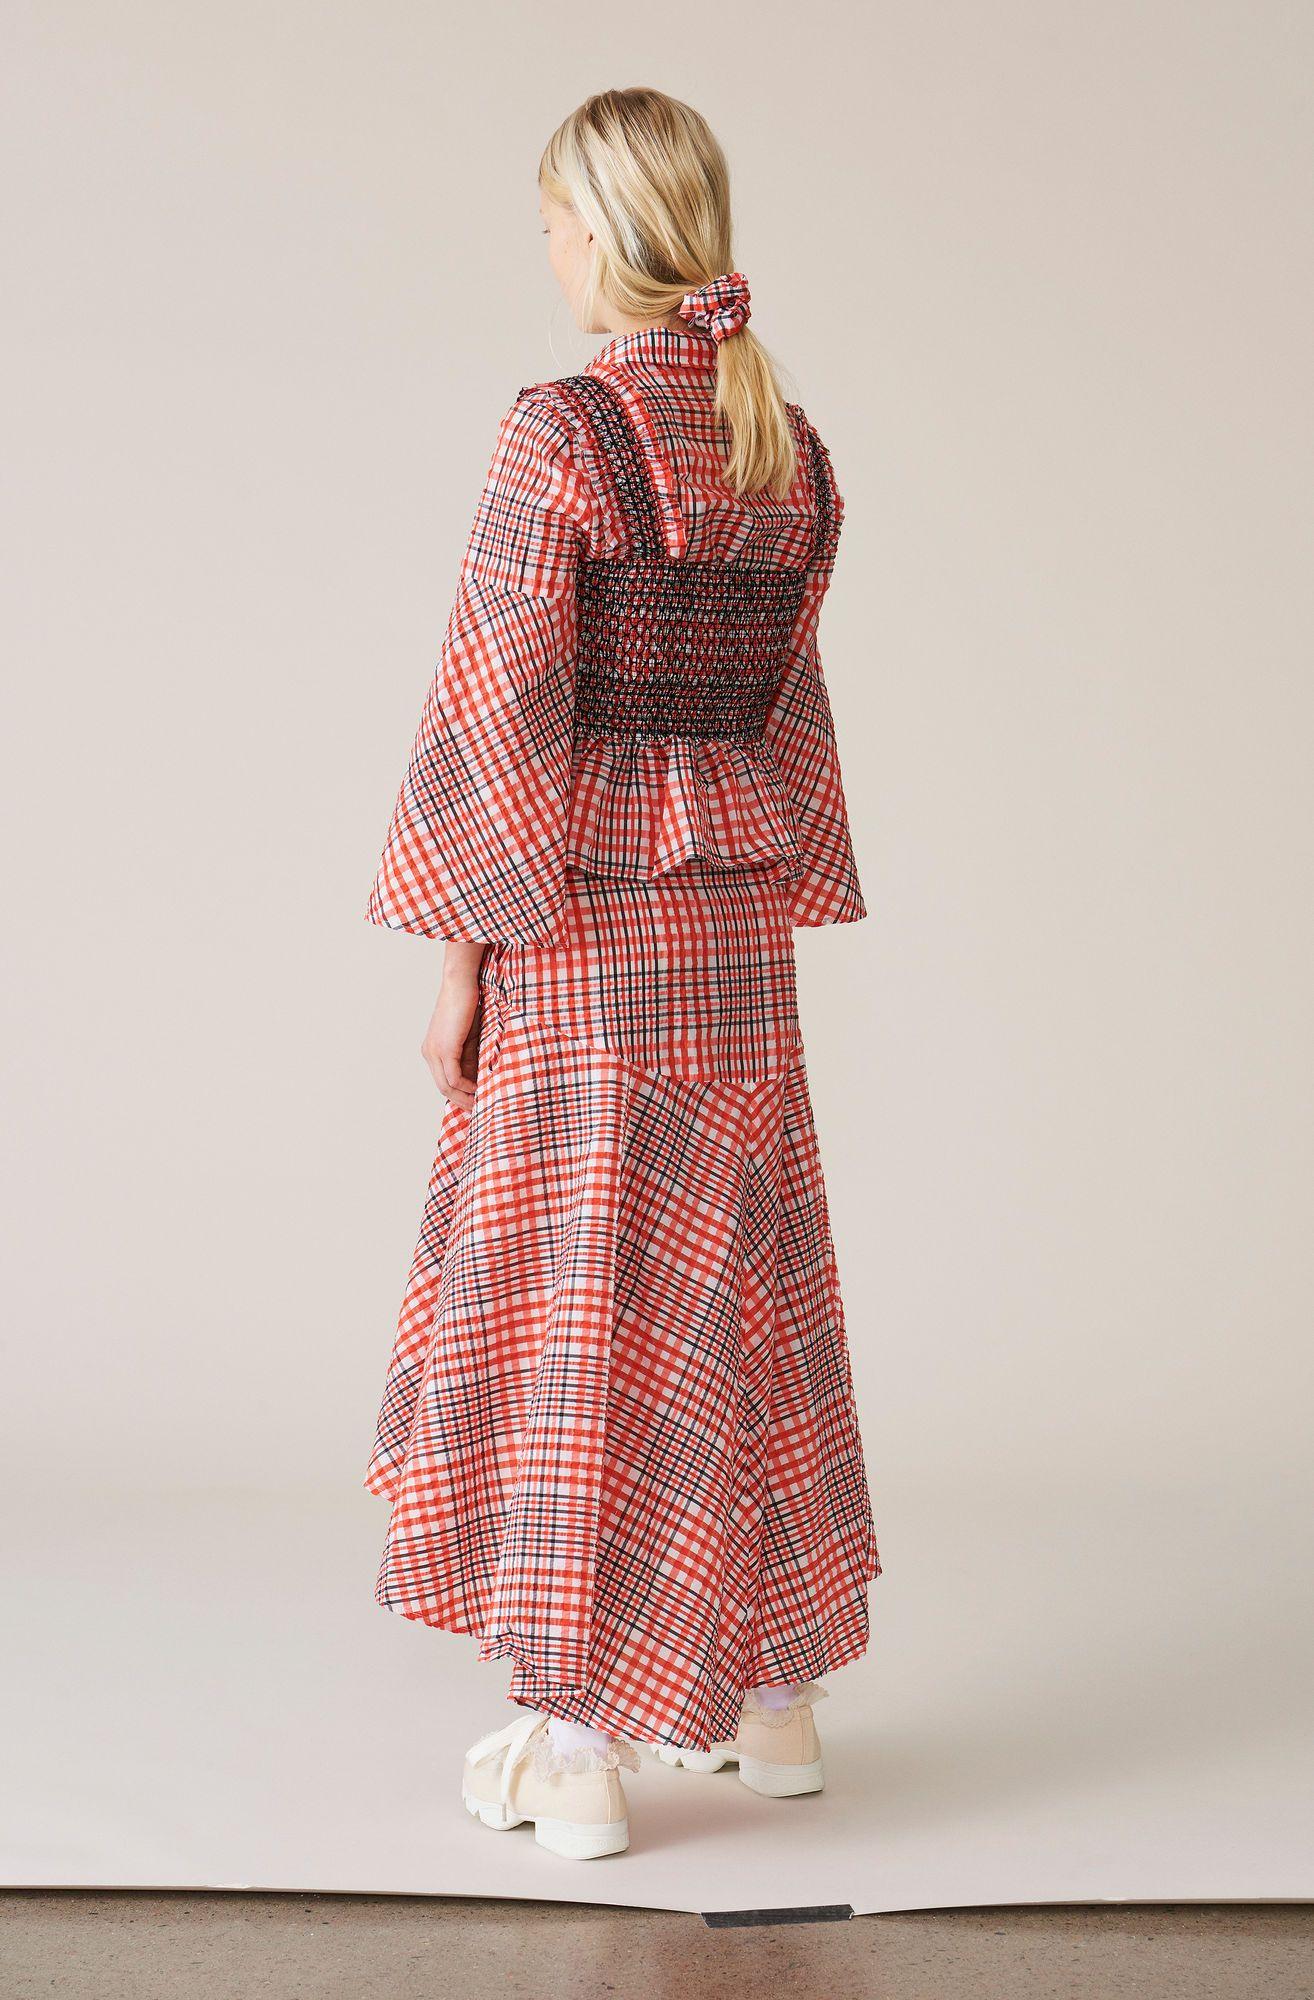 65b9229f21 Charron Wrap Skirt, Big Apple Red, hi-res | GANNI in 2019 | Tops ...